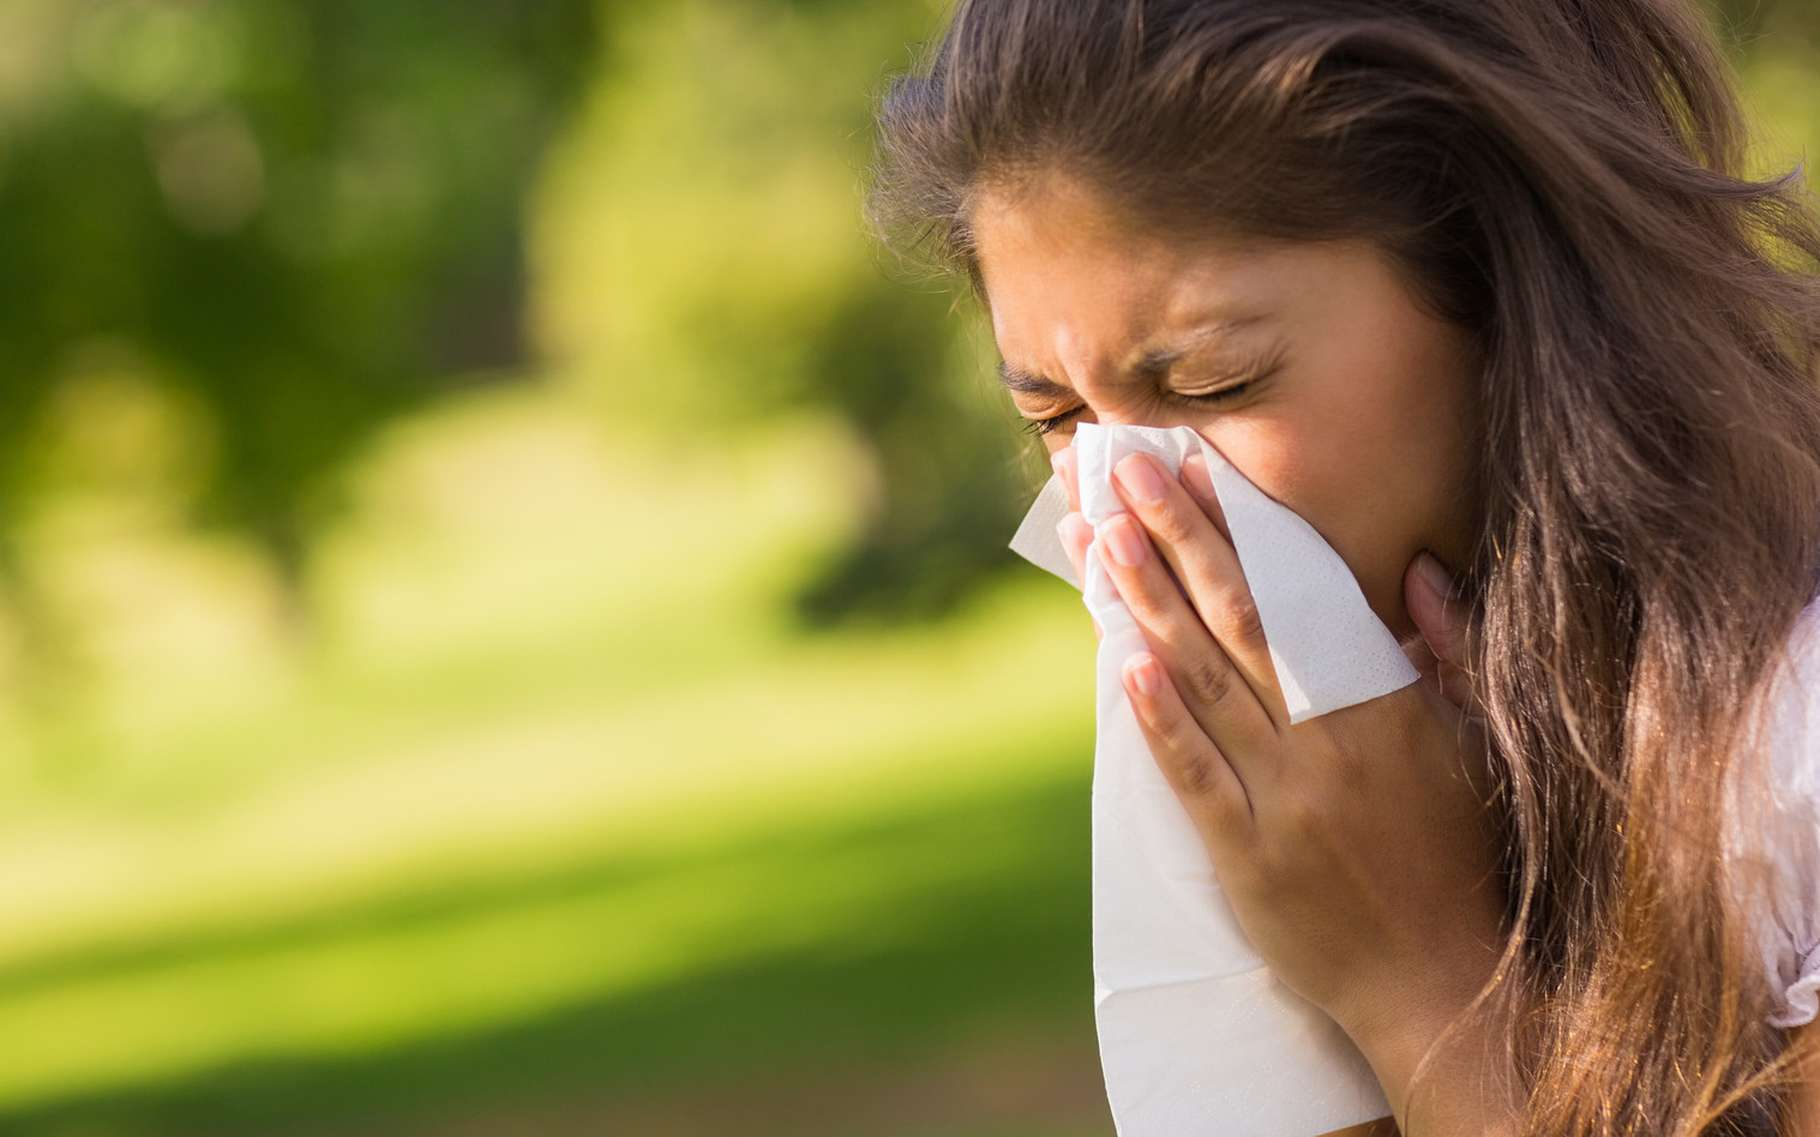 Quand l'asthme se fait allergique. © wavebreakmedia, Shutterstock